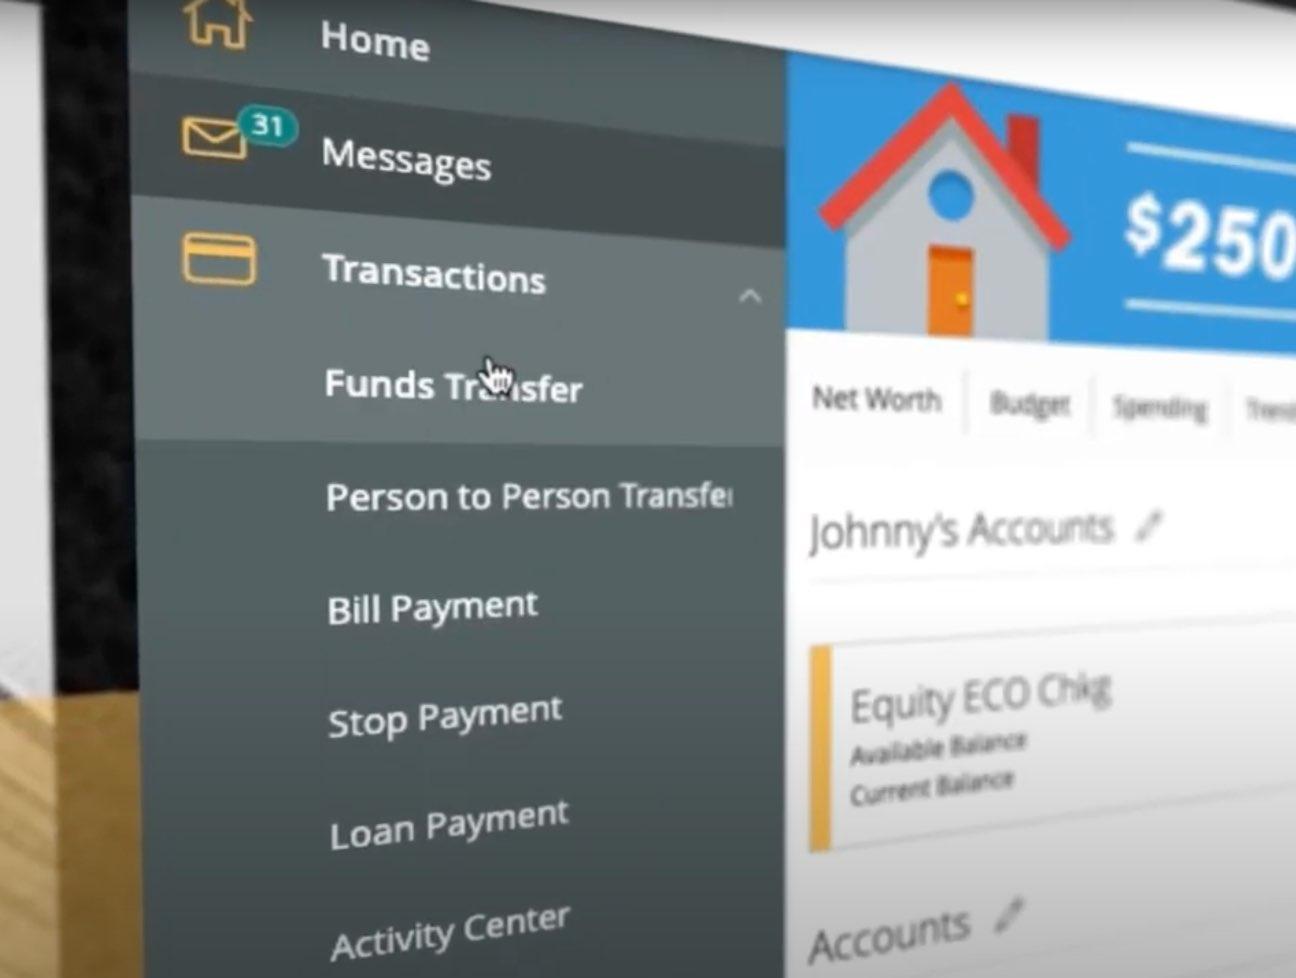 Screenshot of the Equity Bank digital banking app